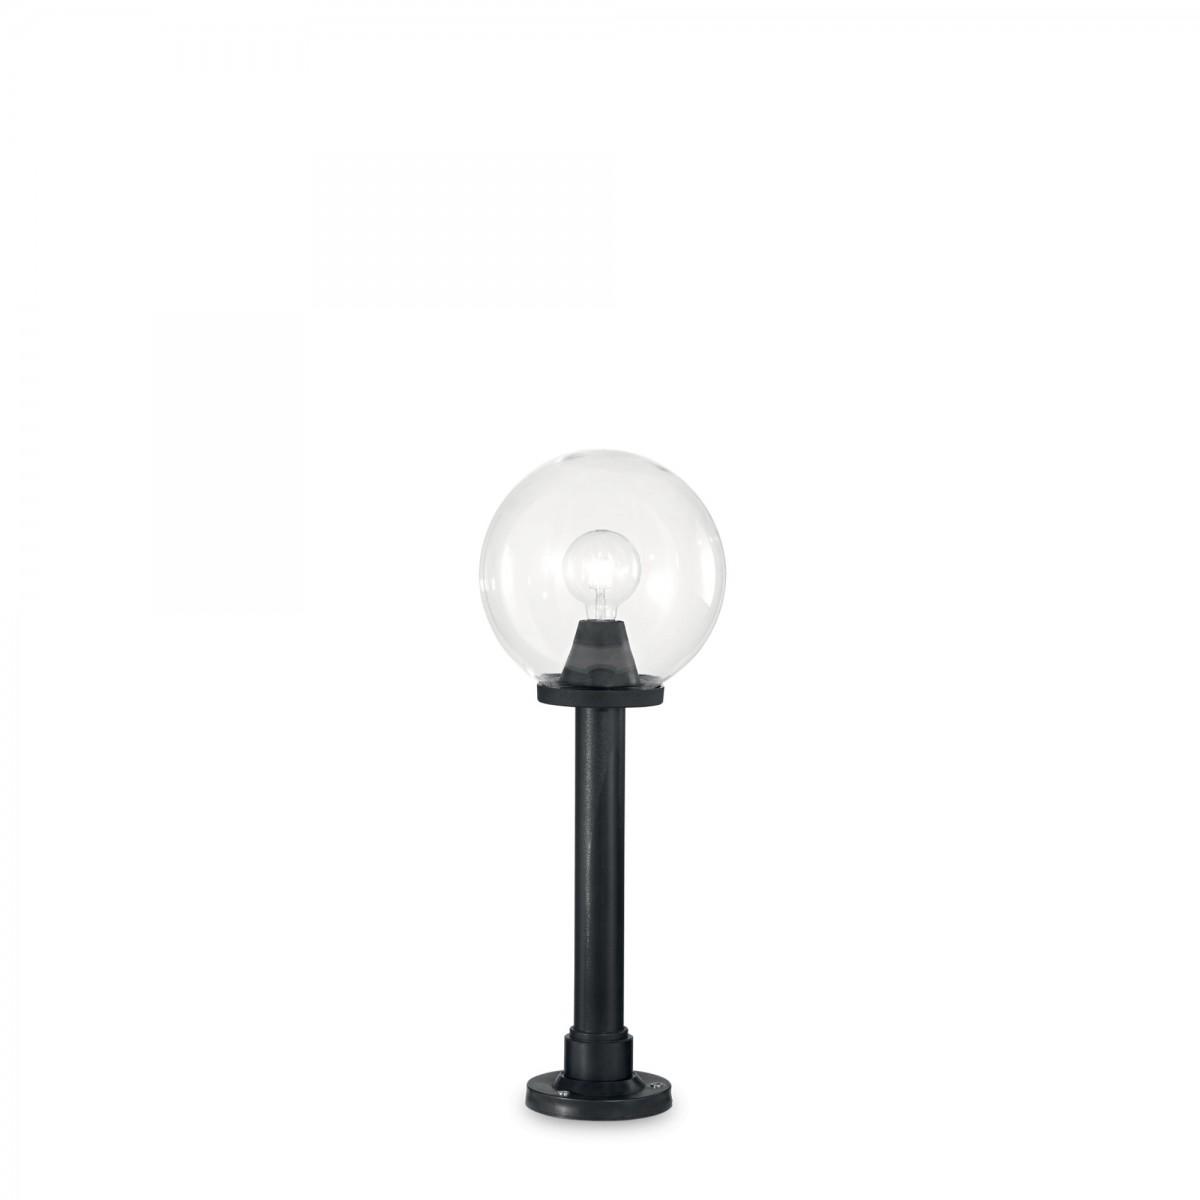 Ideal Lux 187556 venkovní lampa classic Globe 1x23W|E27